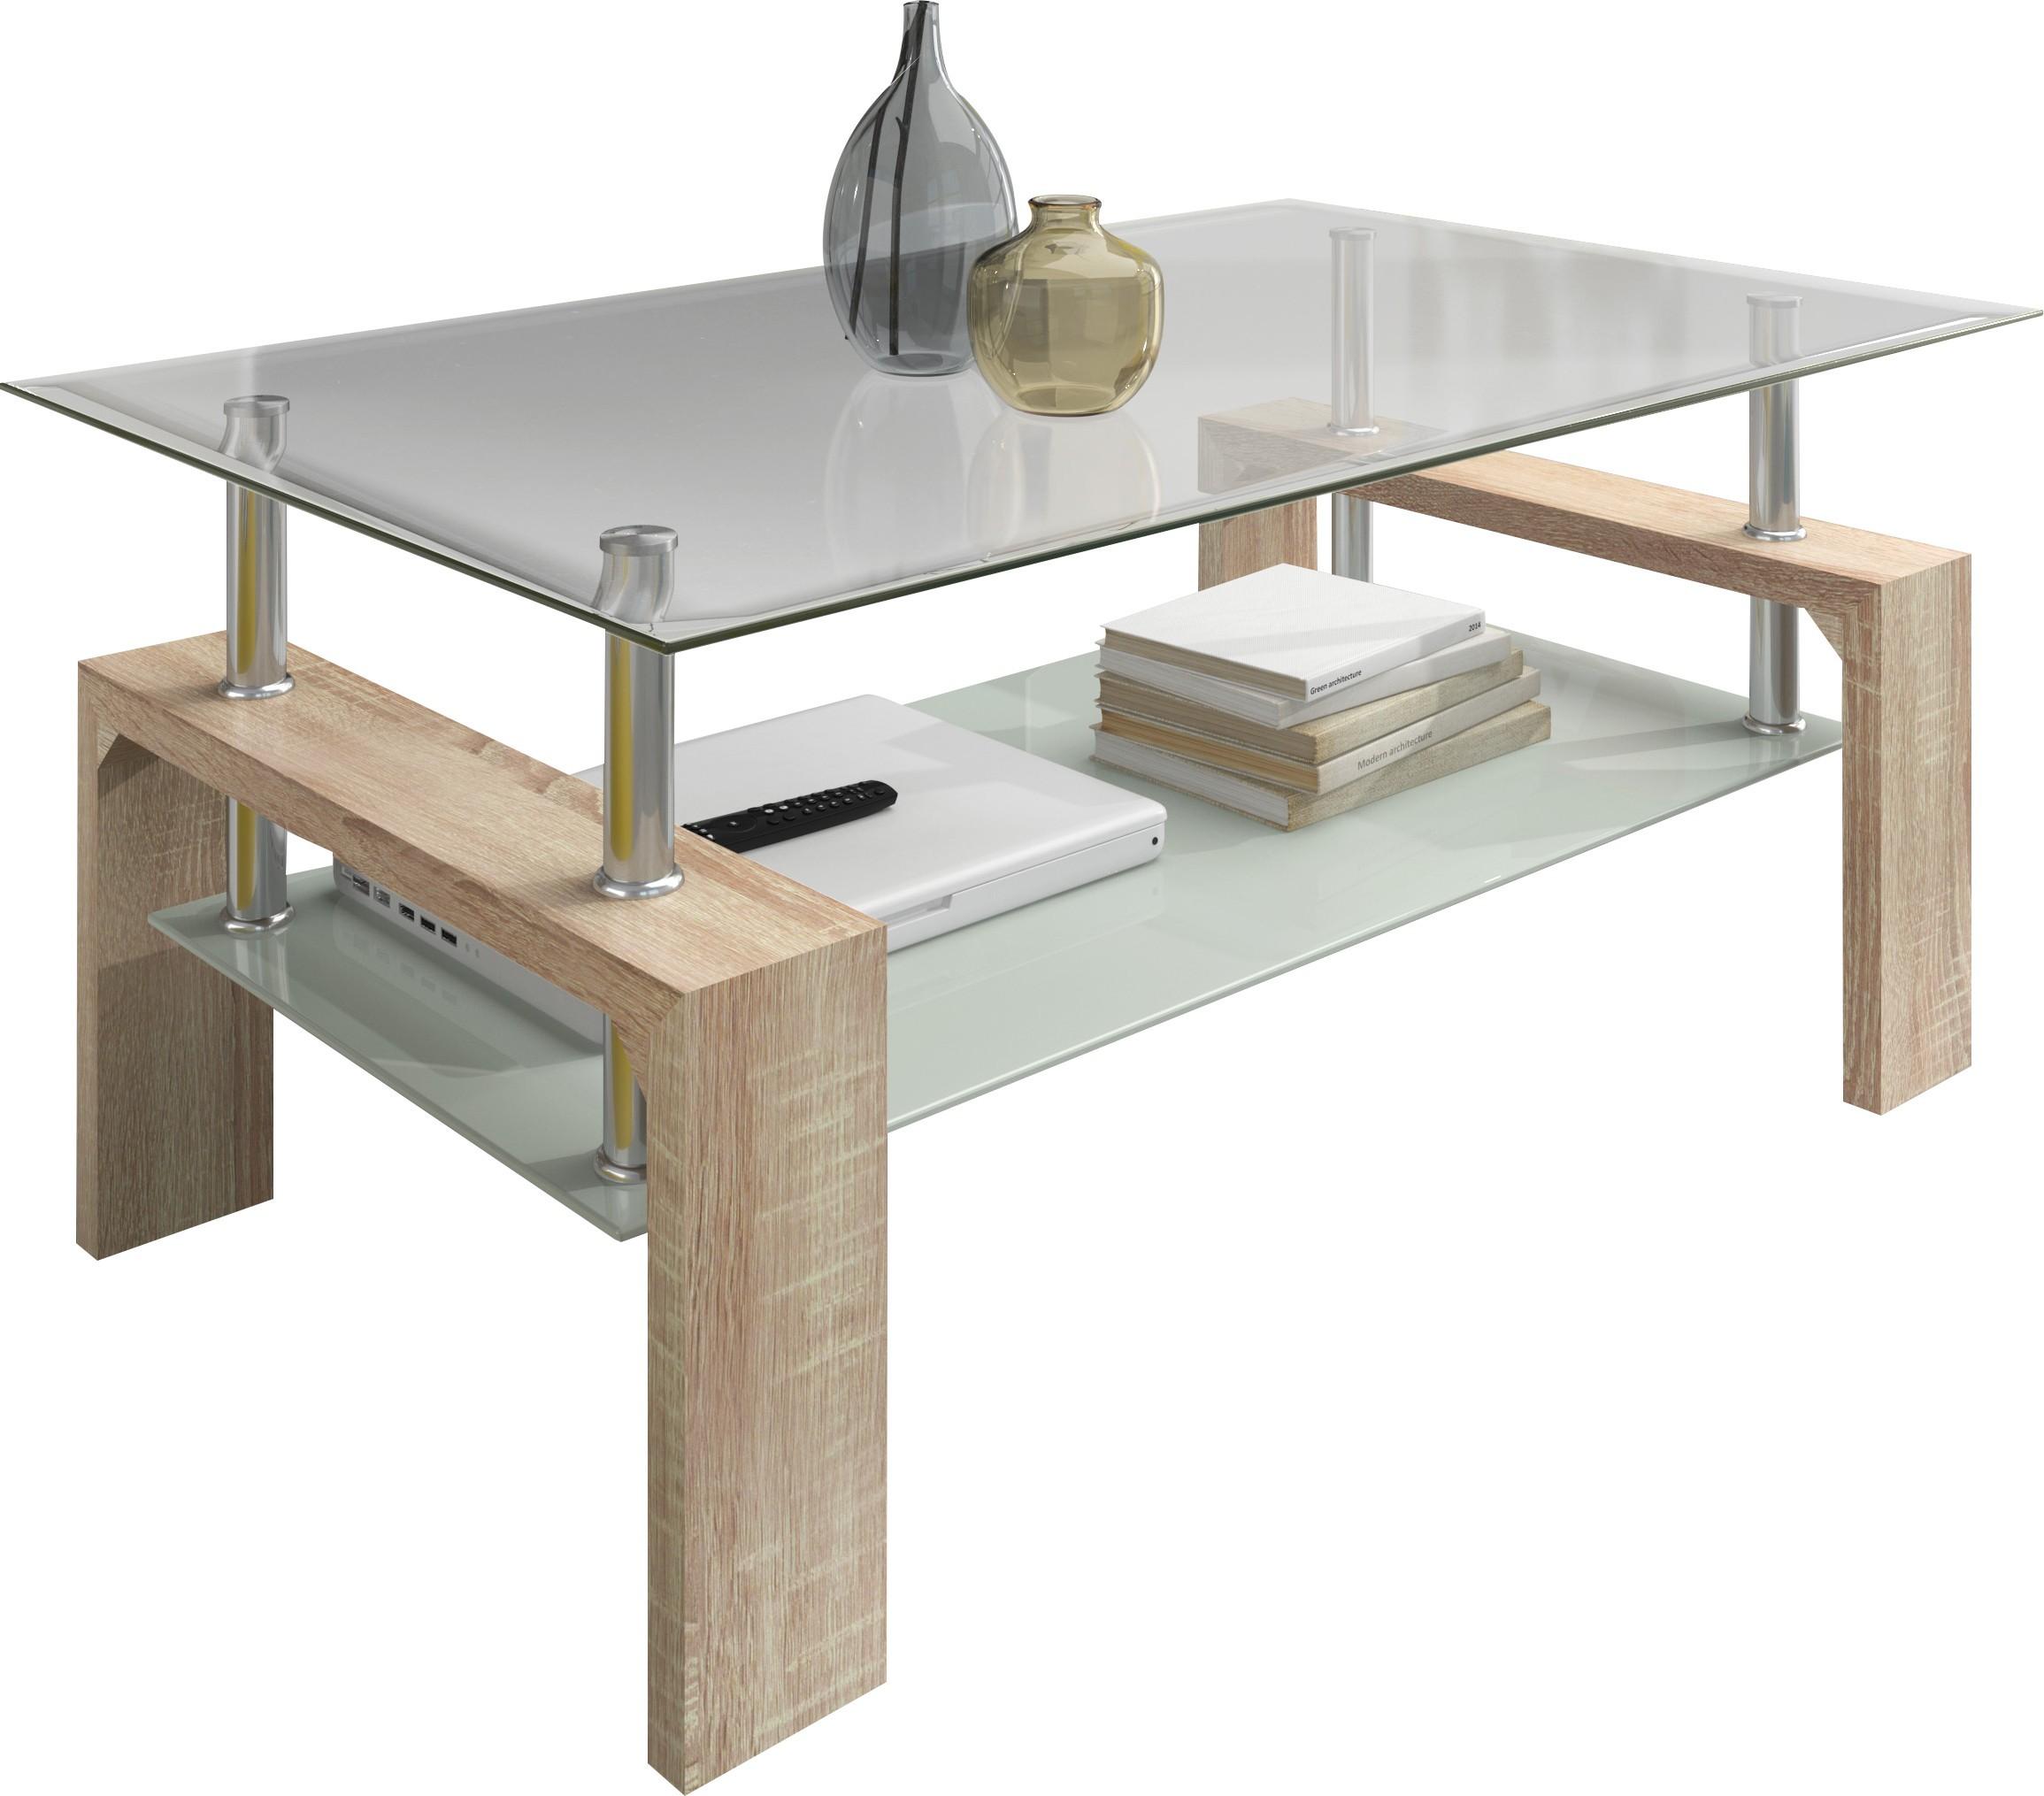 Table basse bois naturel et verre tremp kari - Table basse verre trempe ...